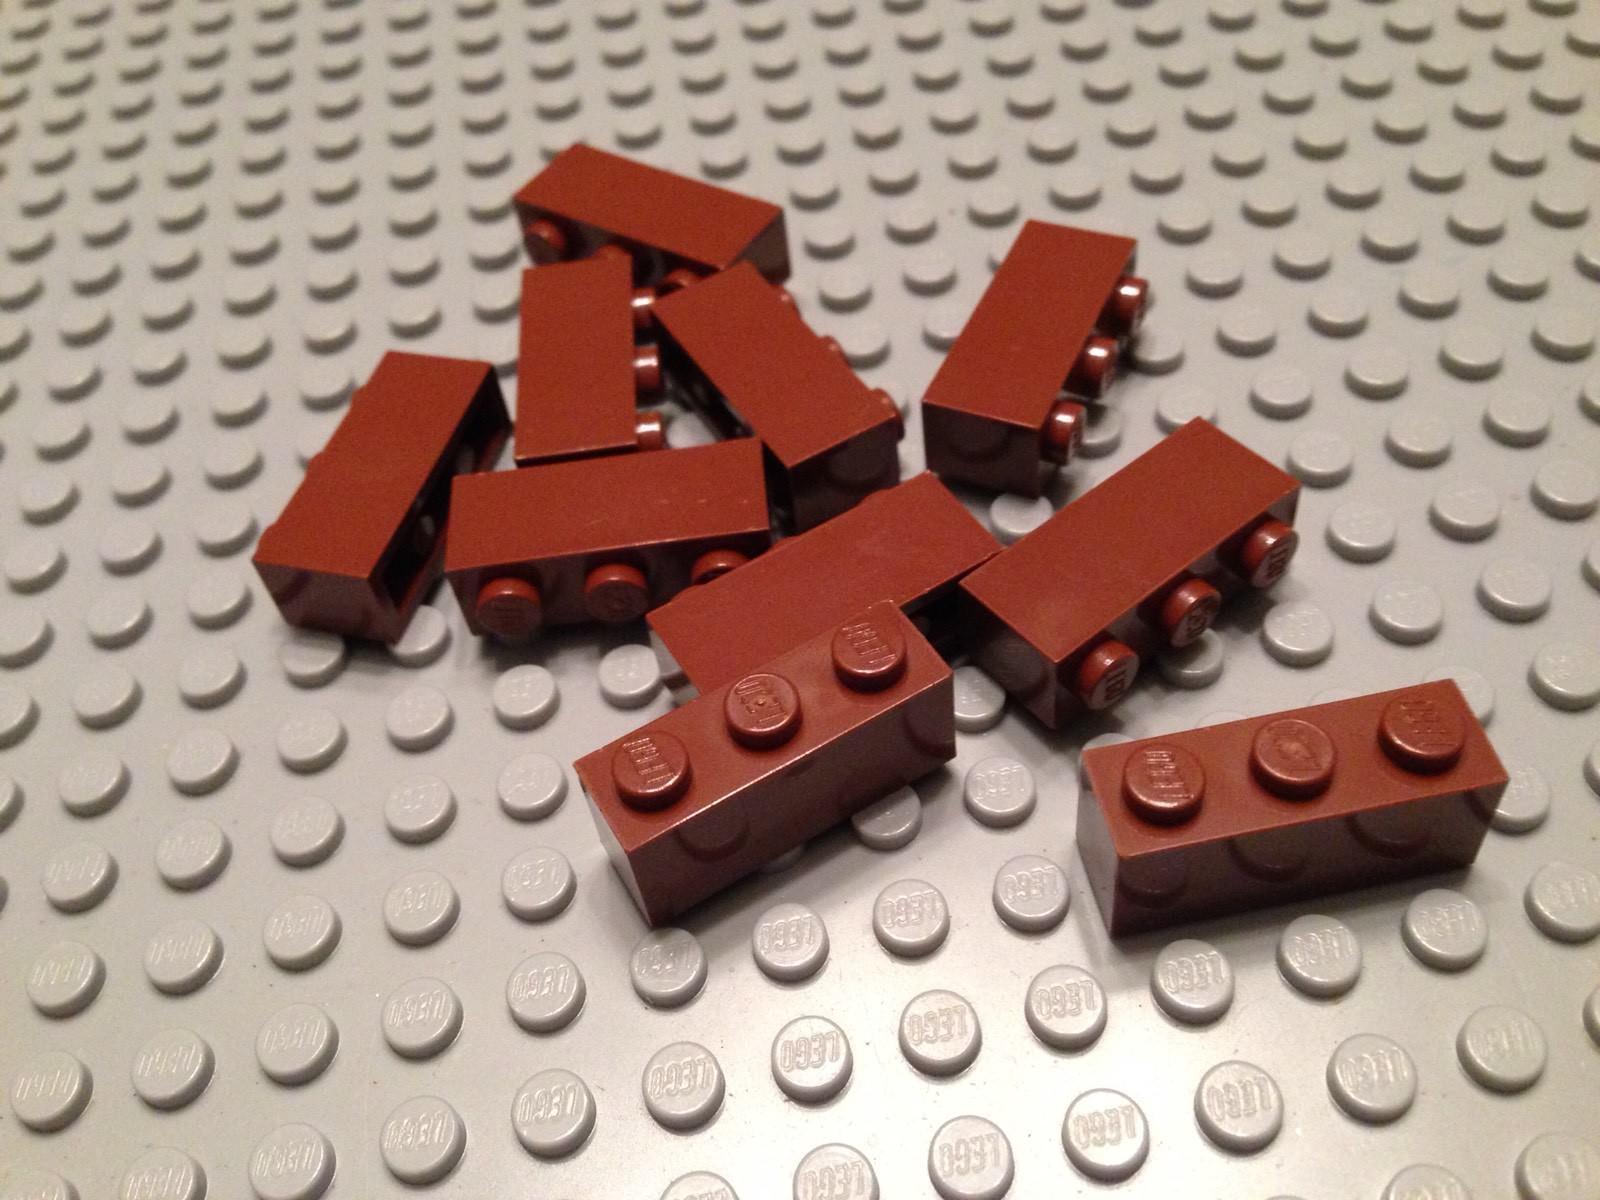 300324 in gelb 2x2 Noppen NEU CITY LEGO ClASSIC FRIENDS  50 Bausteine 3003